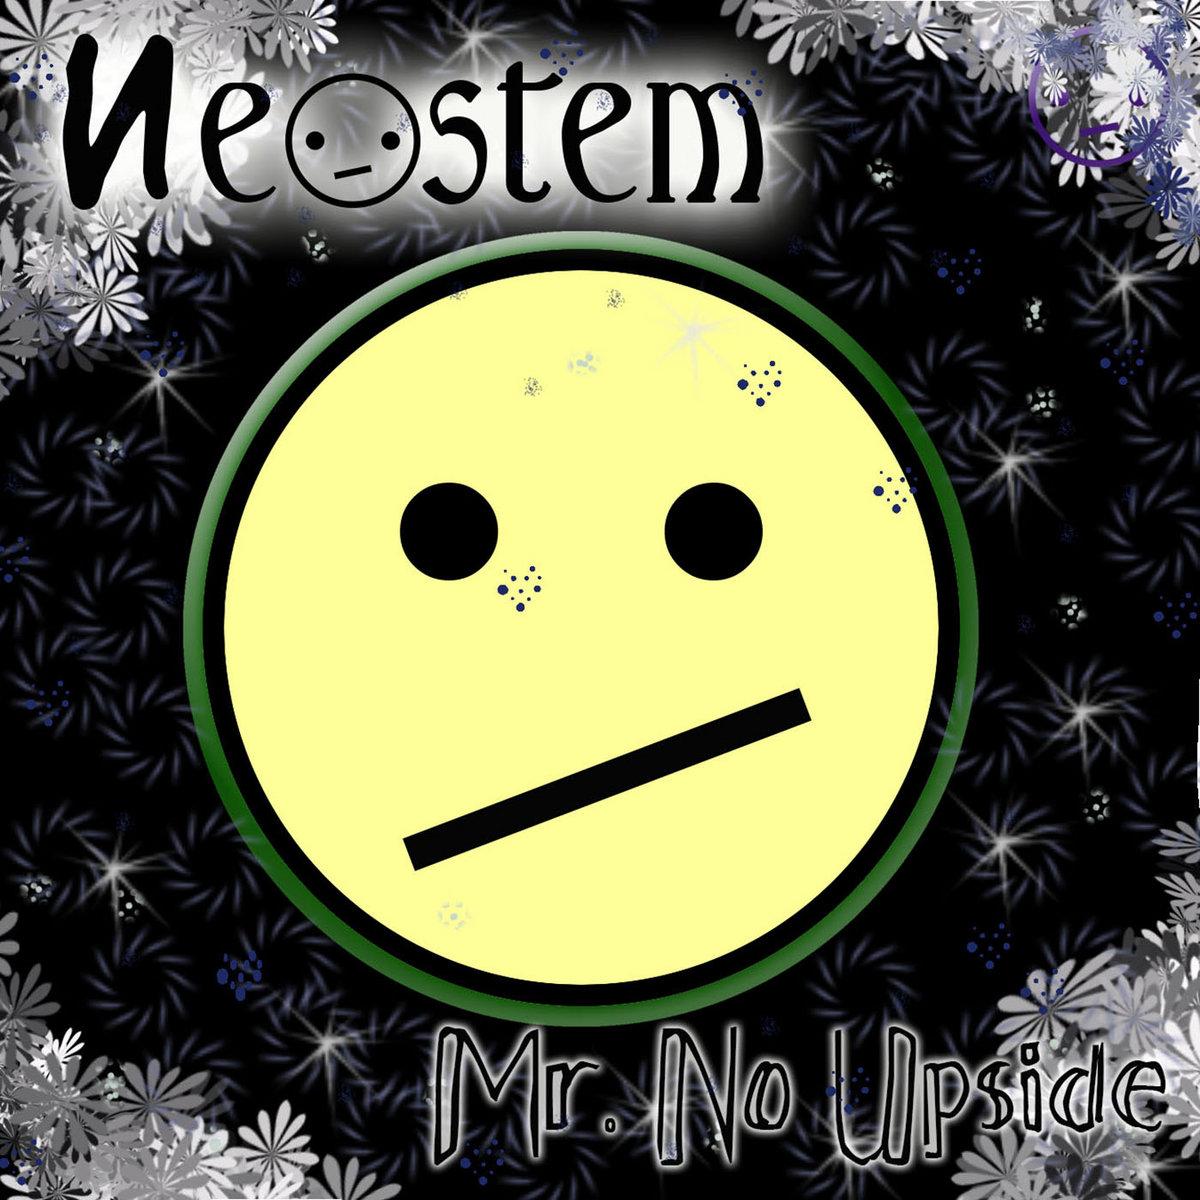 www.facebook.com/neostem